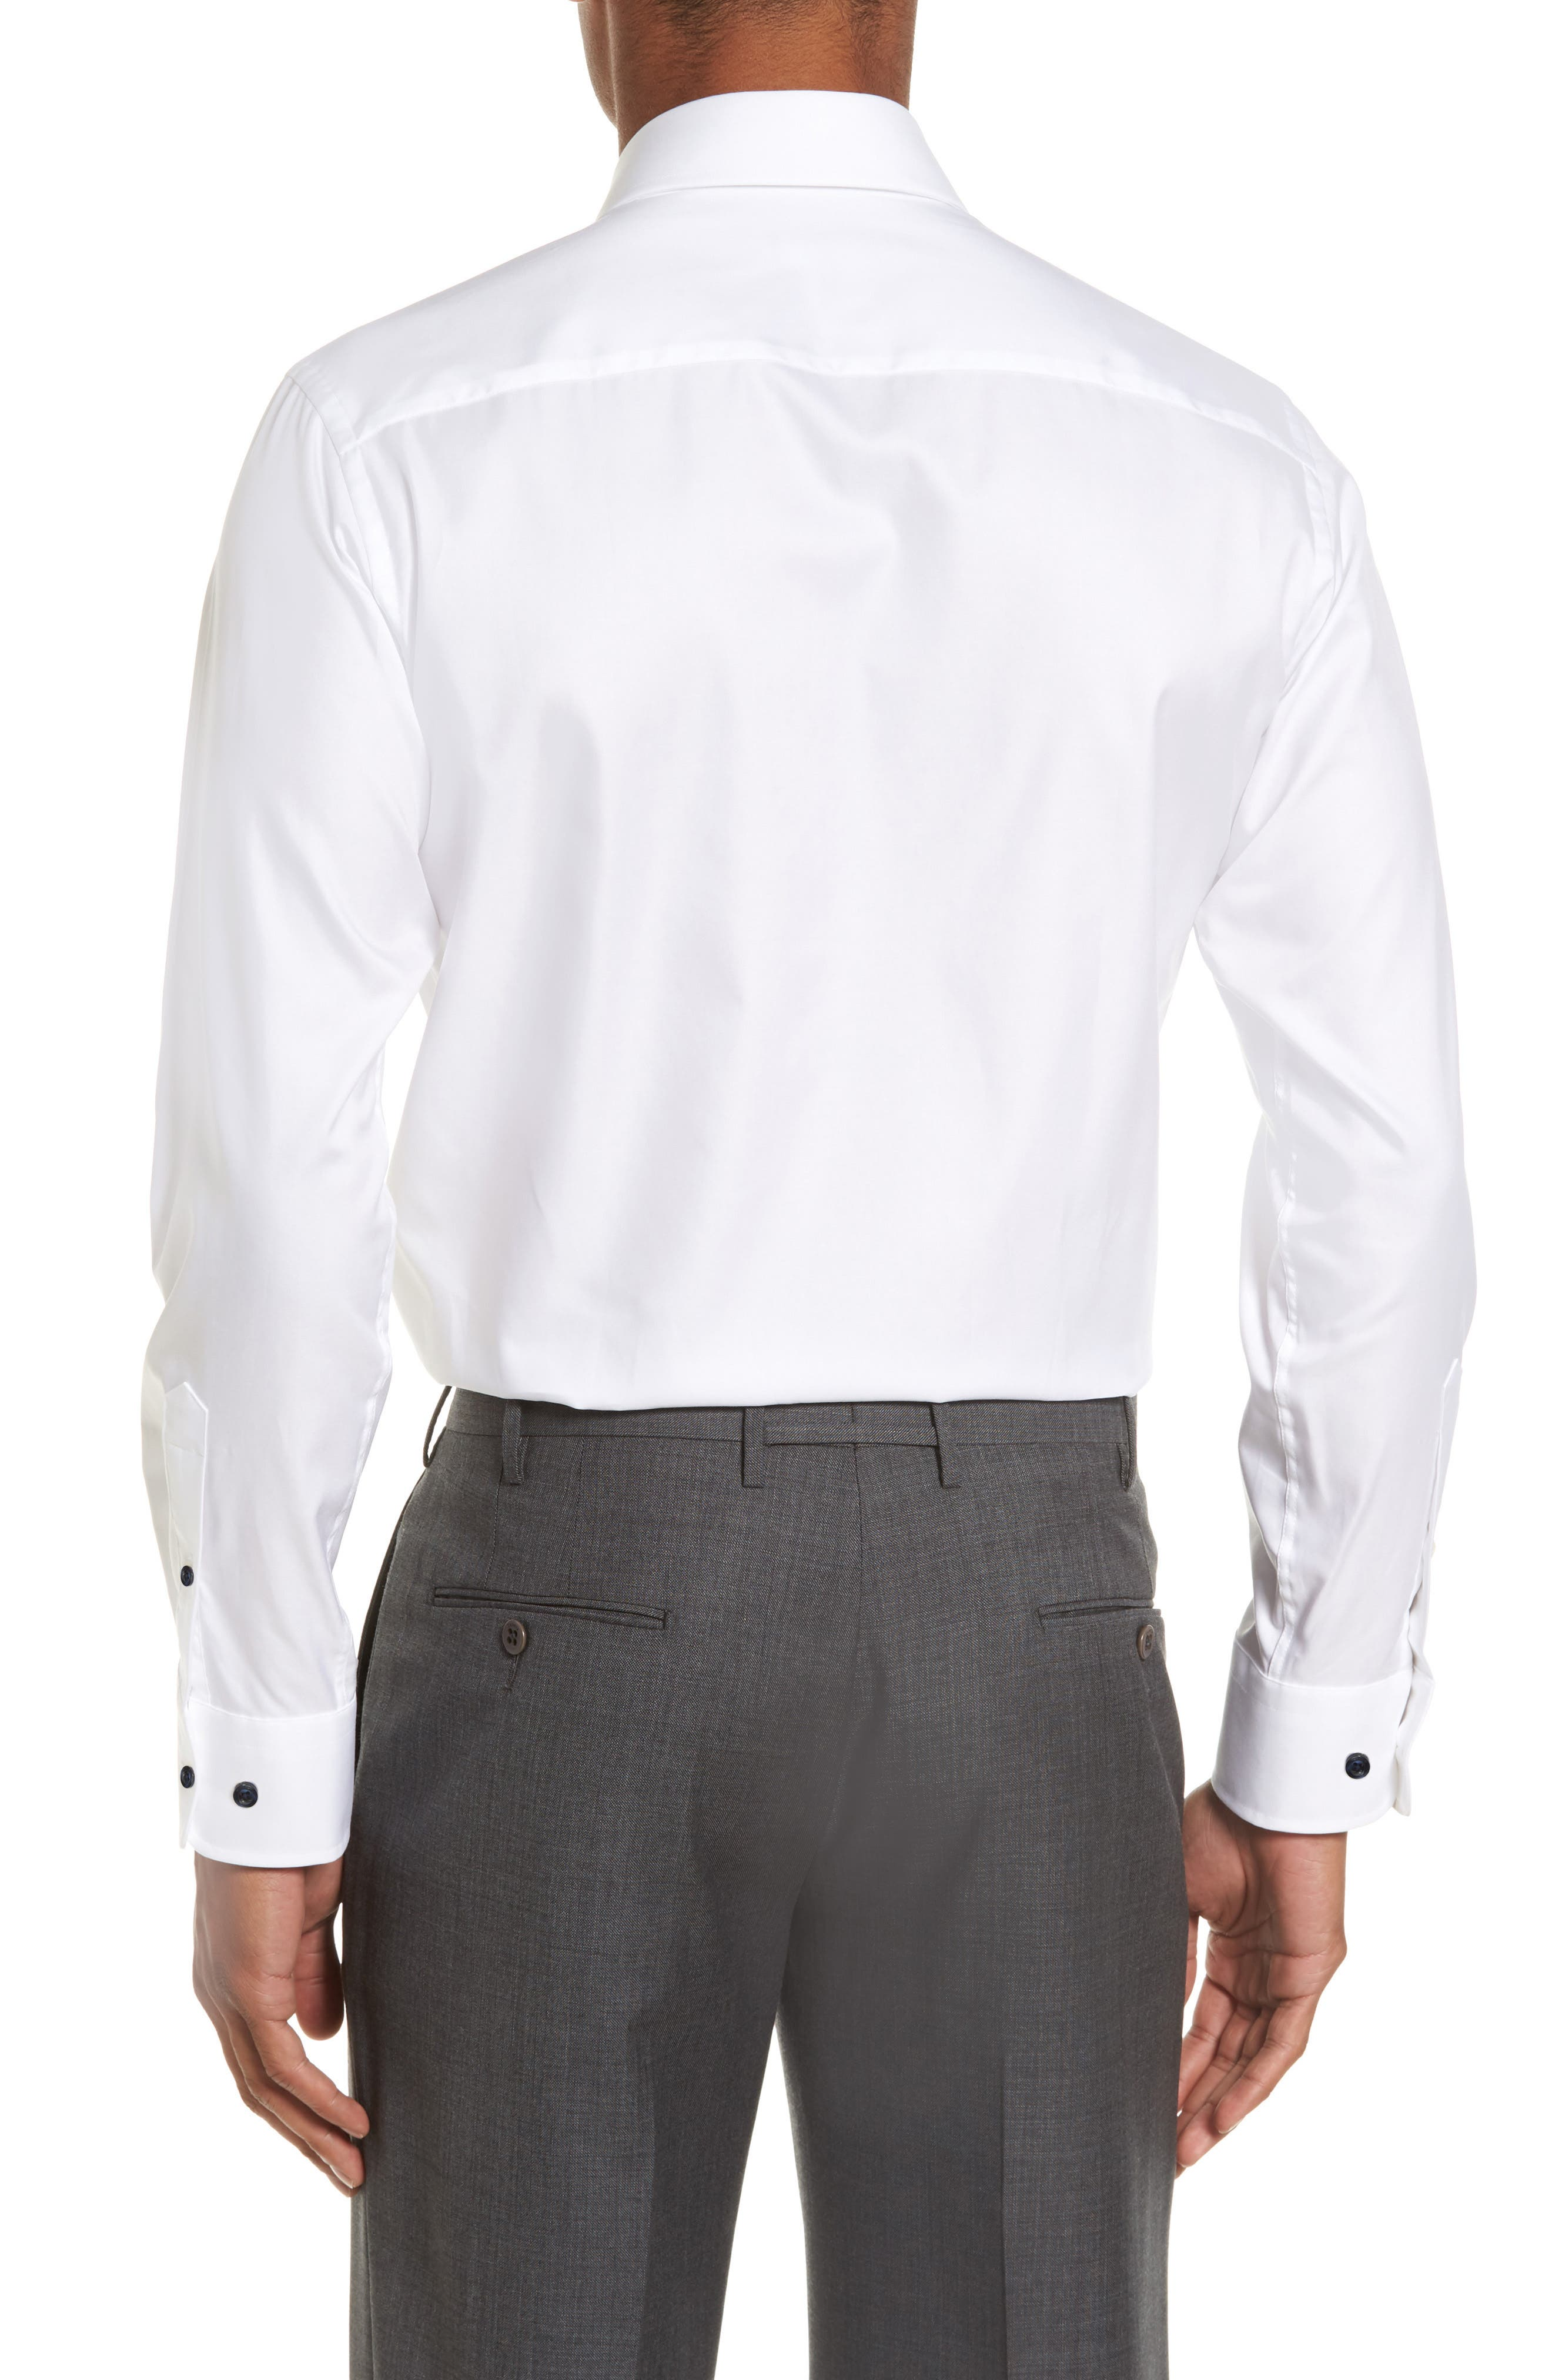 Alternate Image 2  - David Donahue Slim Fit Solid Dress Shirt